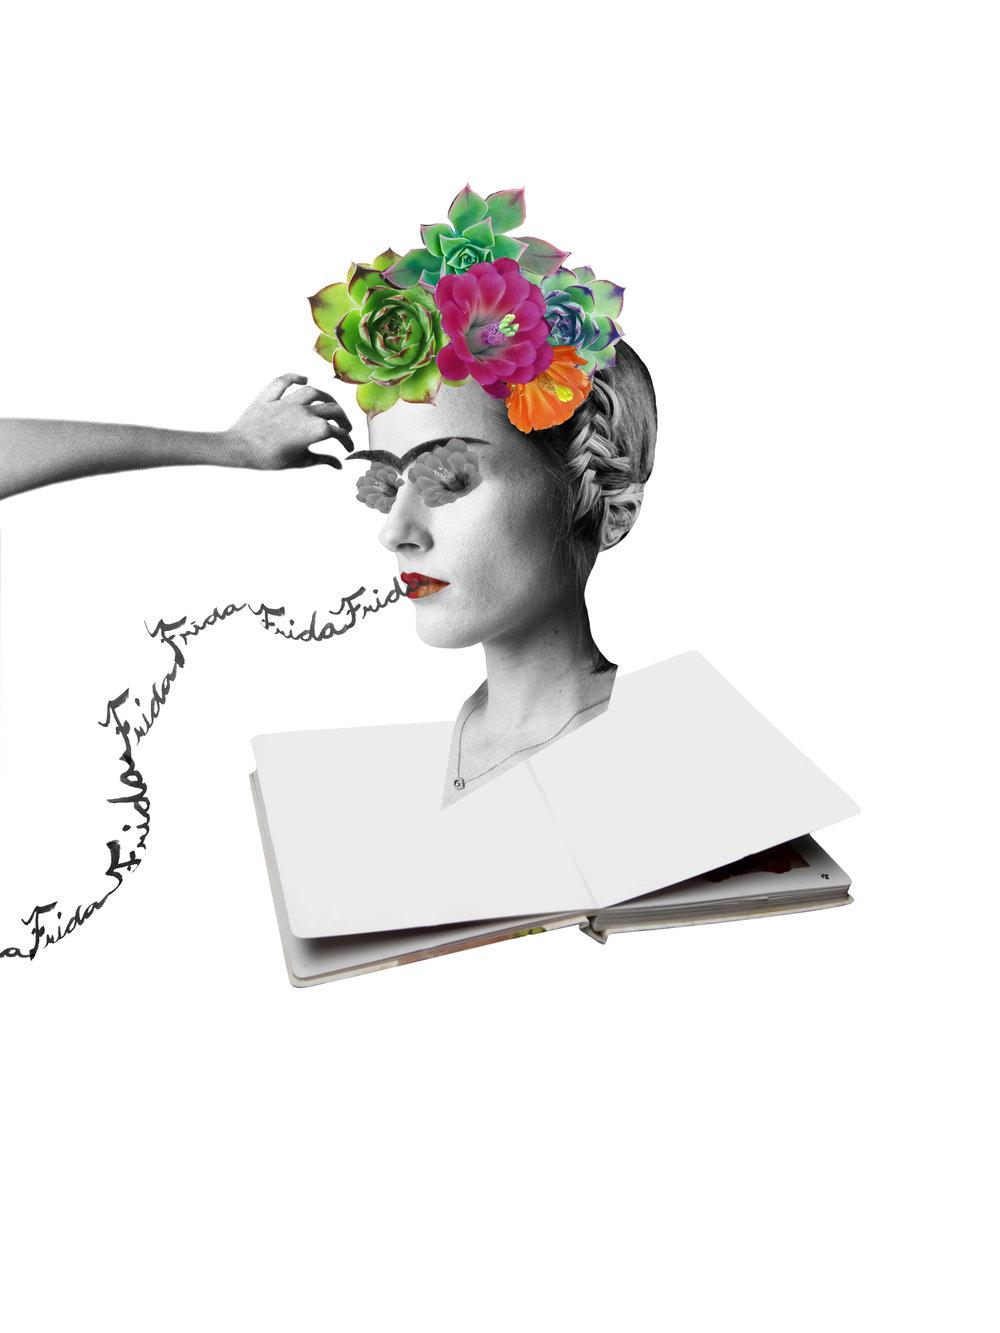 CreamFrida-collage2.jpg